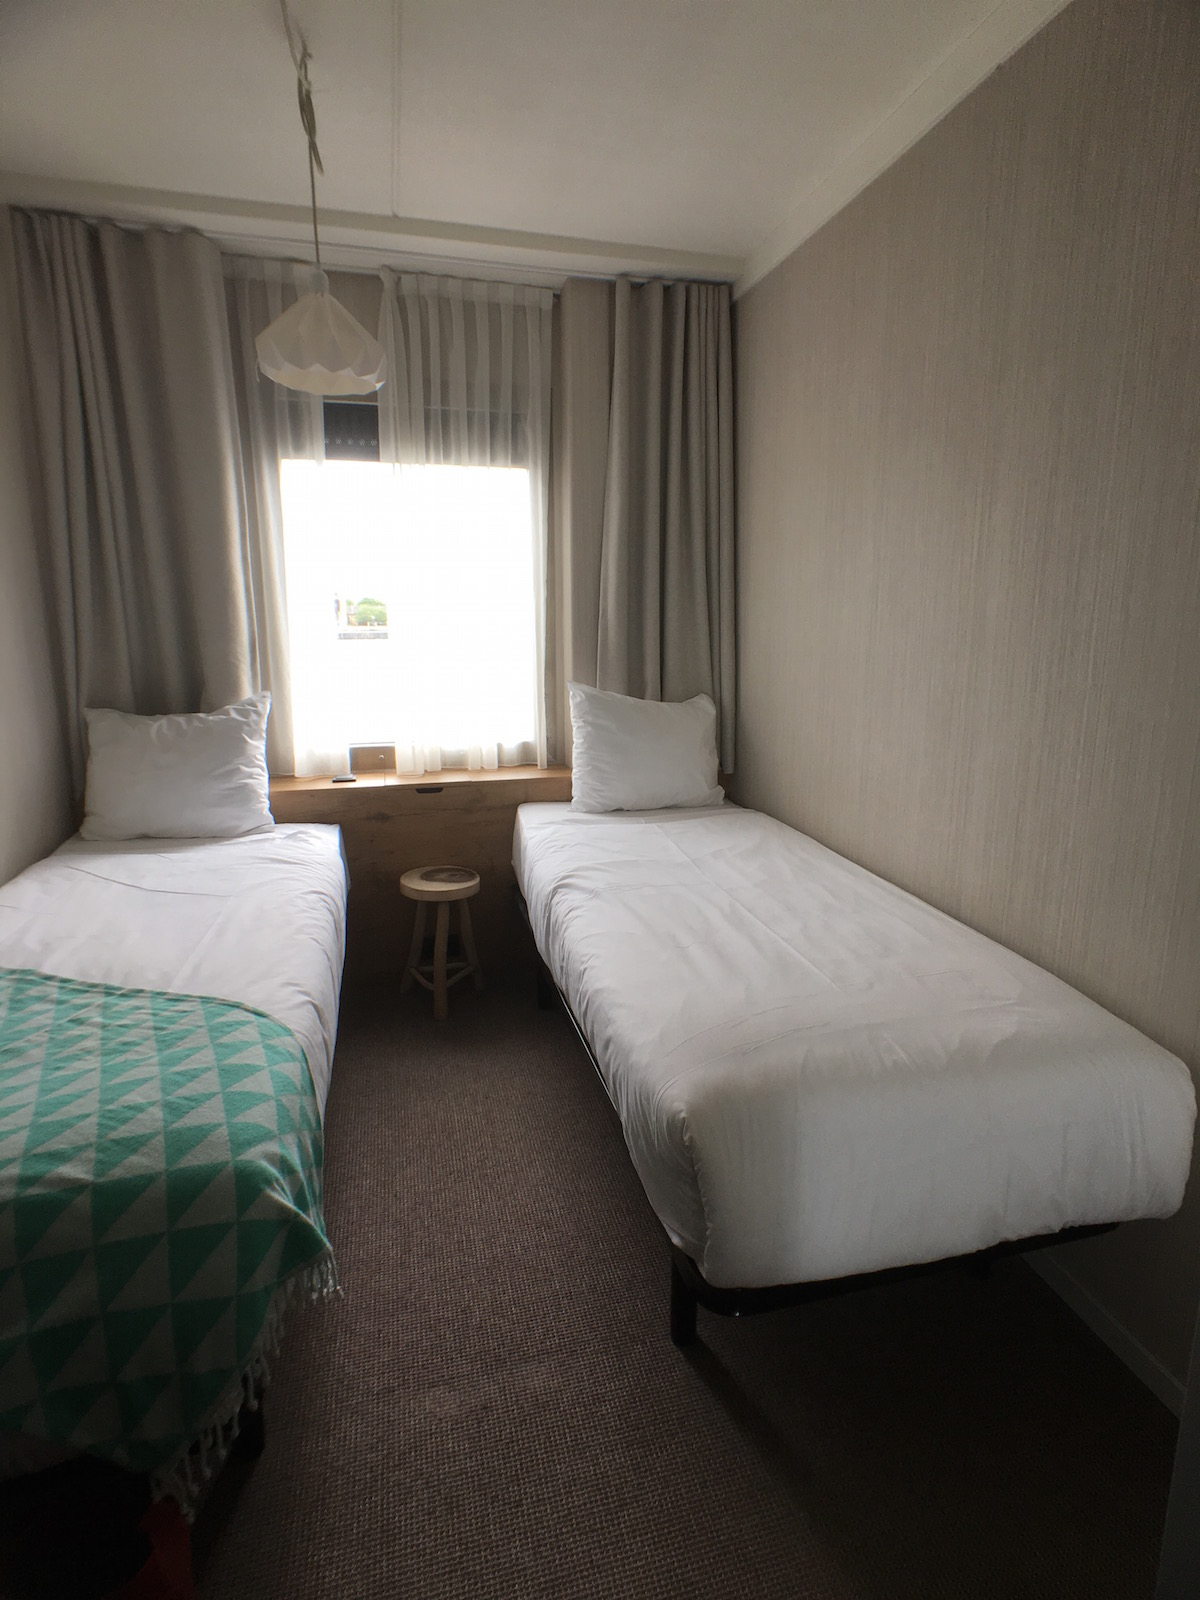 hoiberlin-london-goodhotel-zimmer.jpg